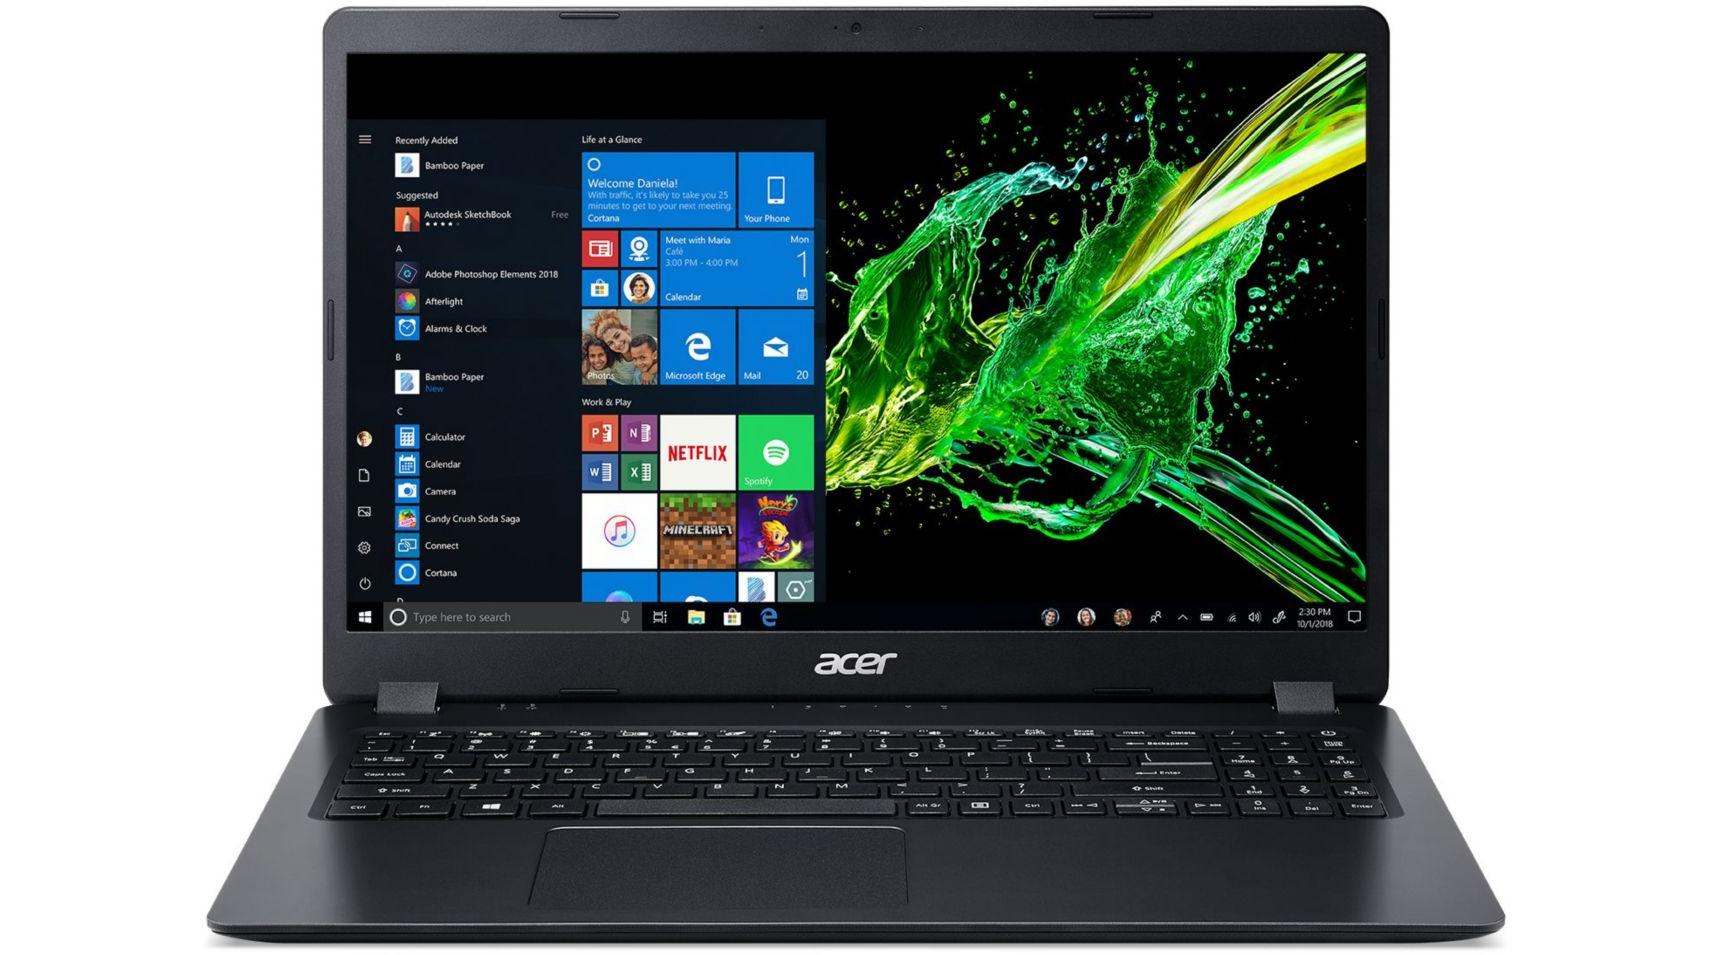 PC Portable Acer Aspire A315-54K-3469 - HD, i3-7020U, 8 Go RAM, 128 Go SSD + 1 To HDD, Windows 10